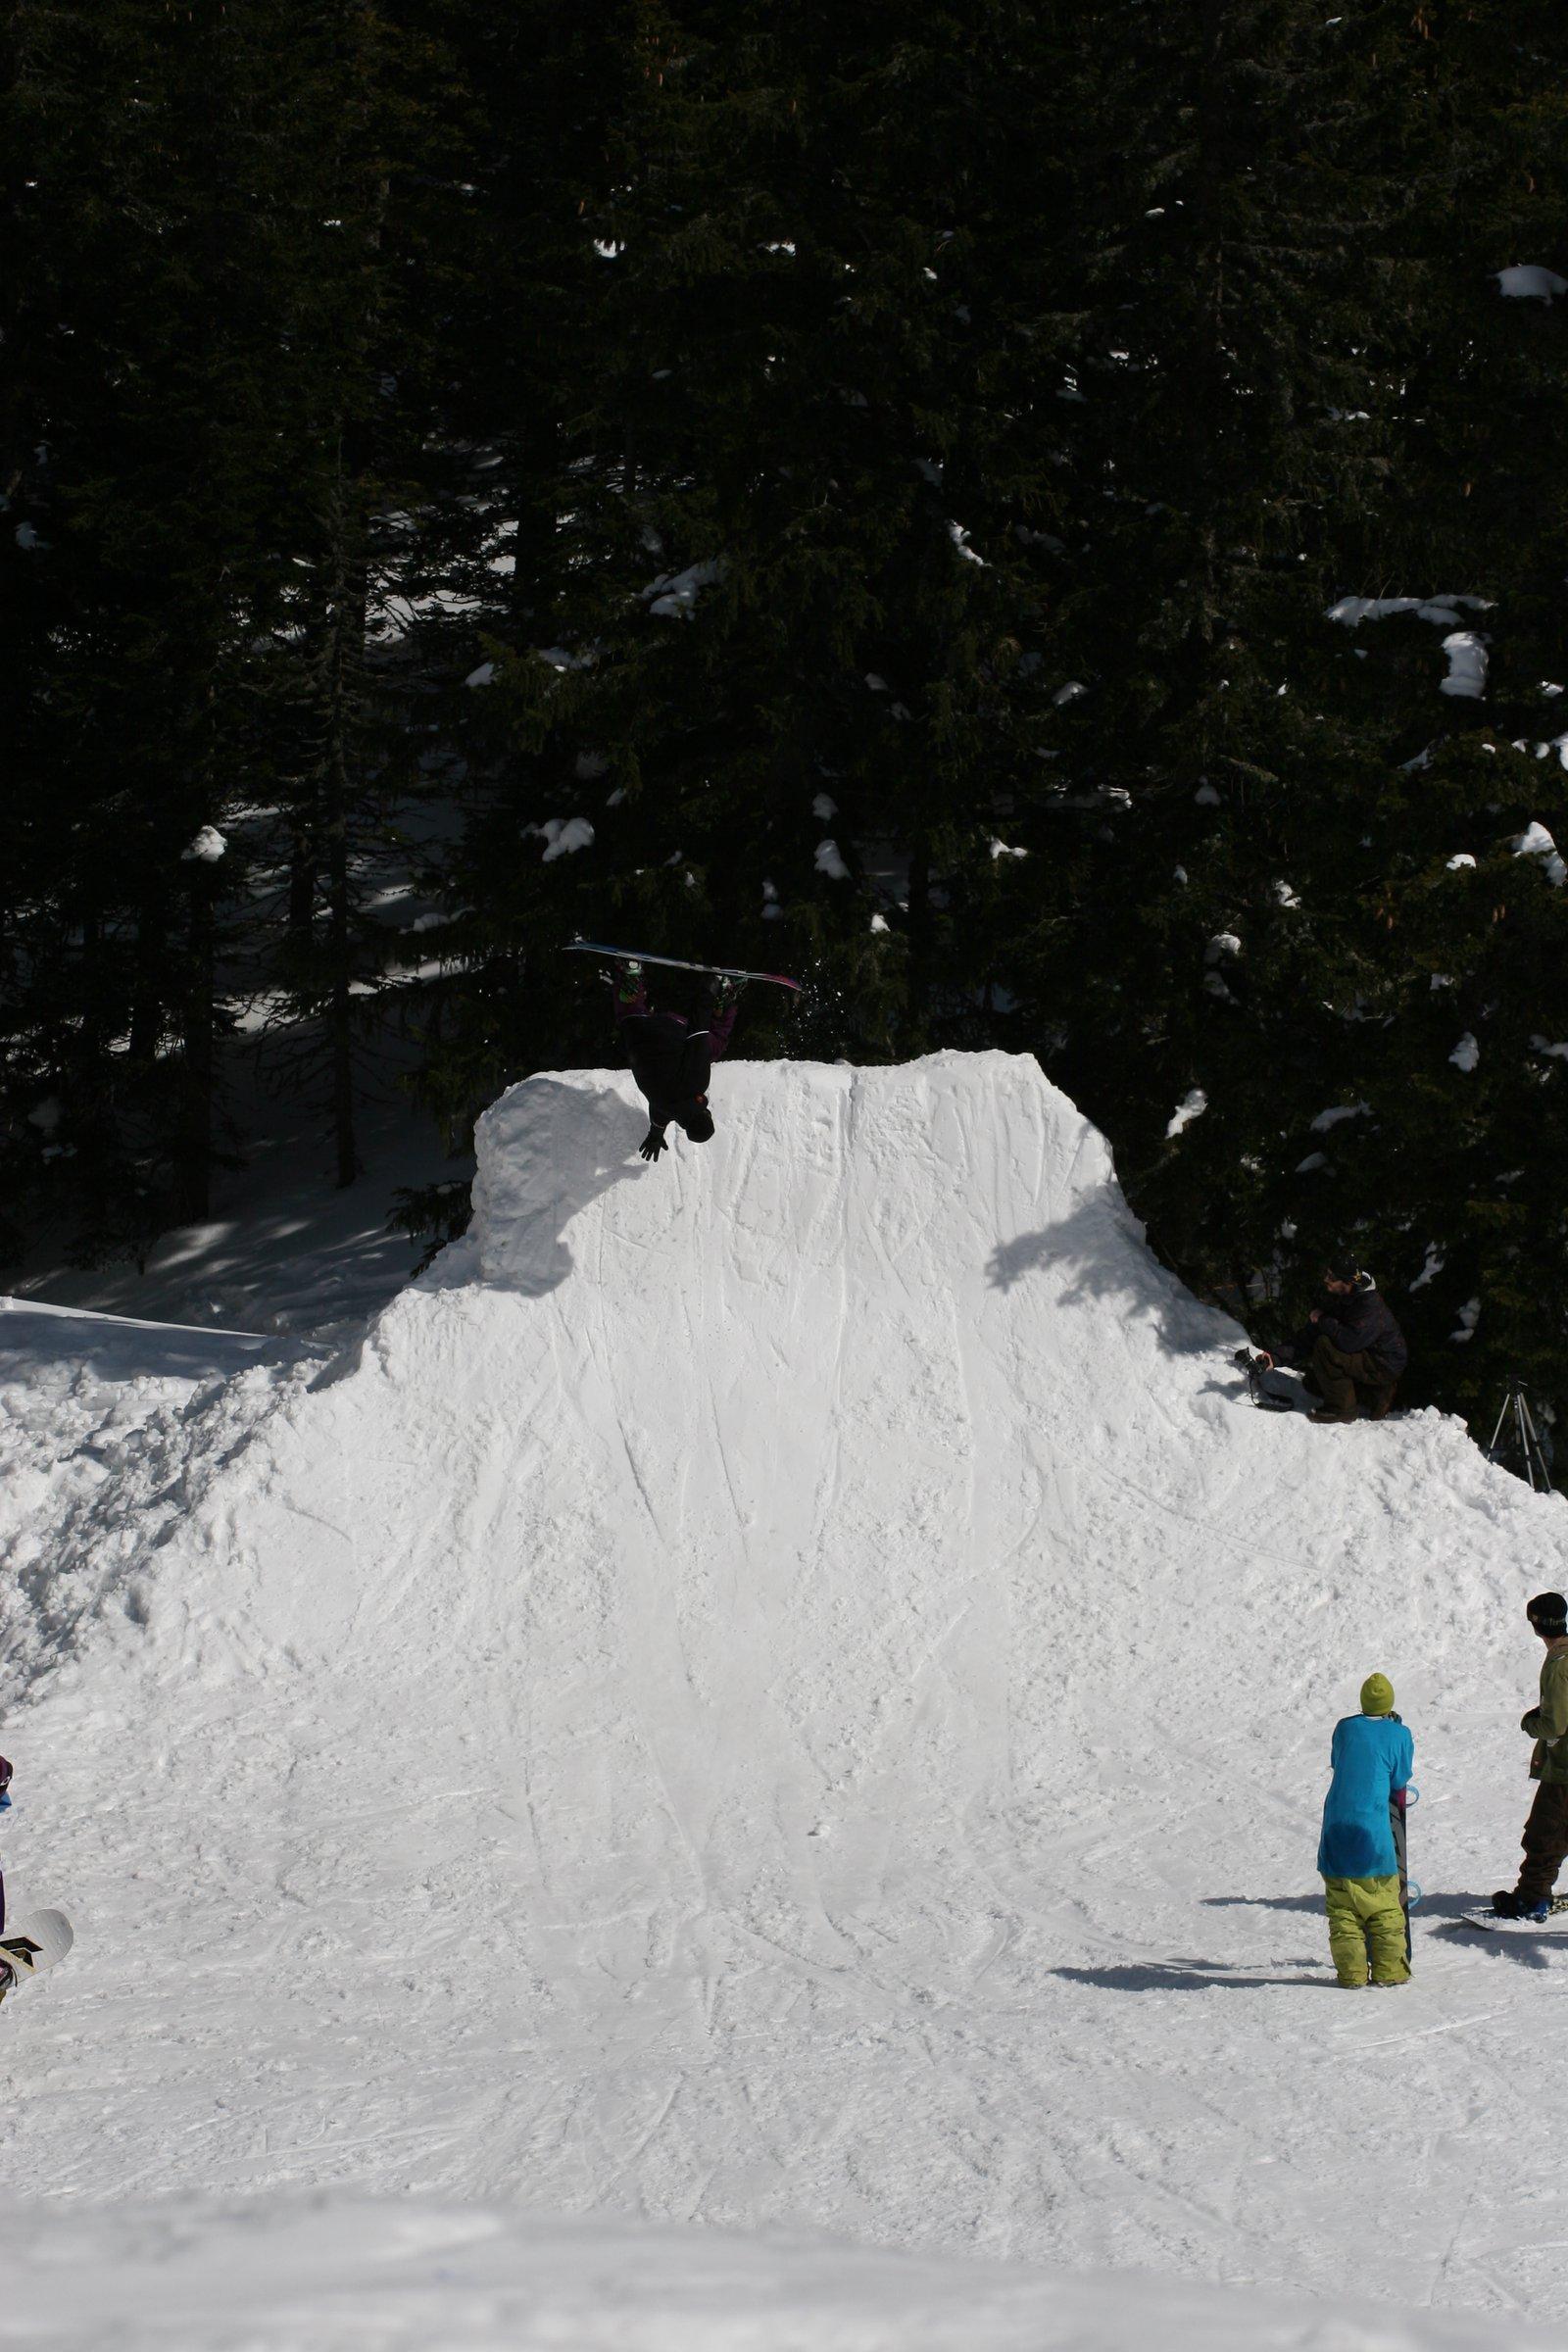 Snowboard handplant